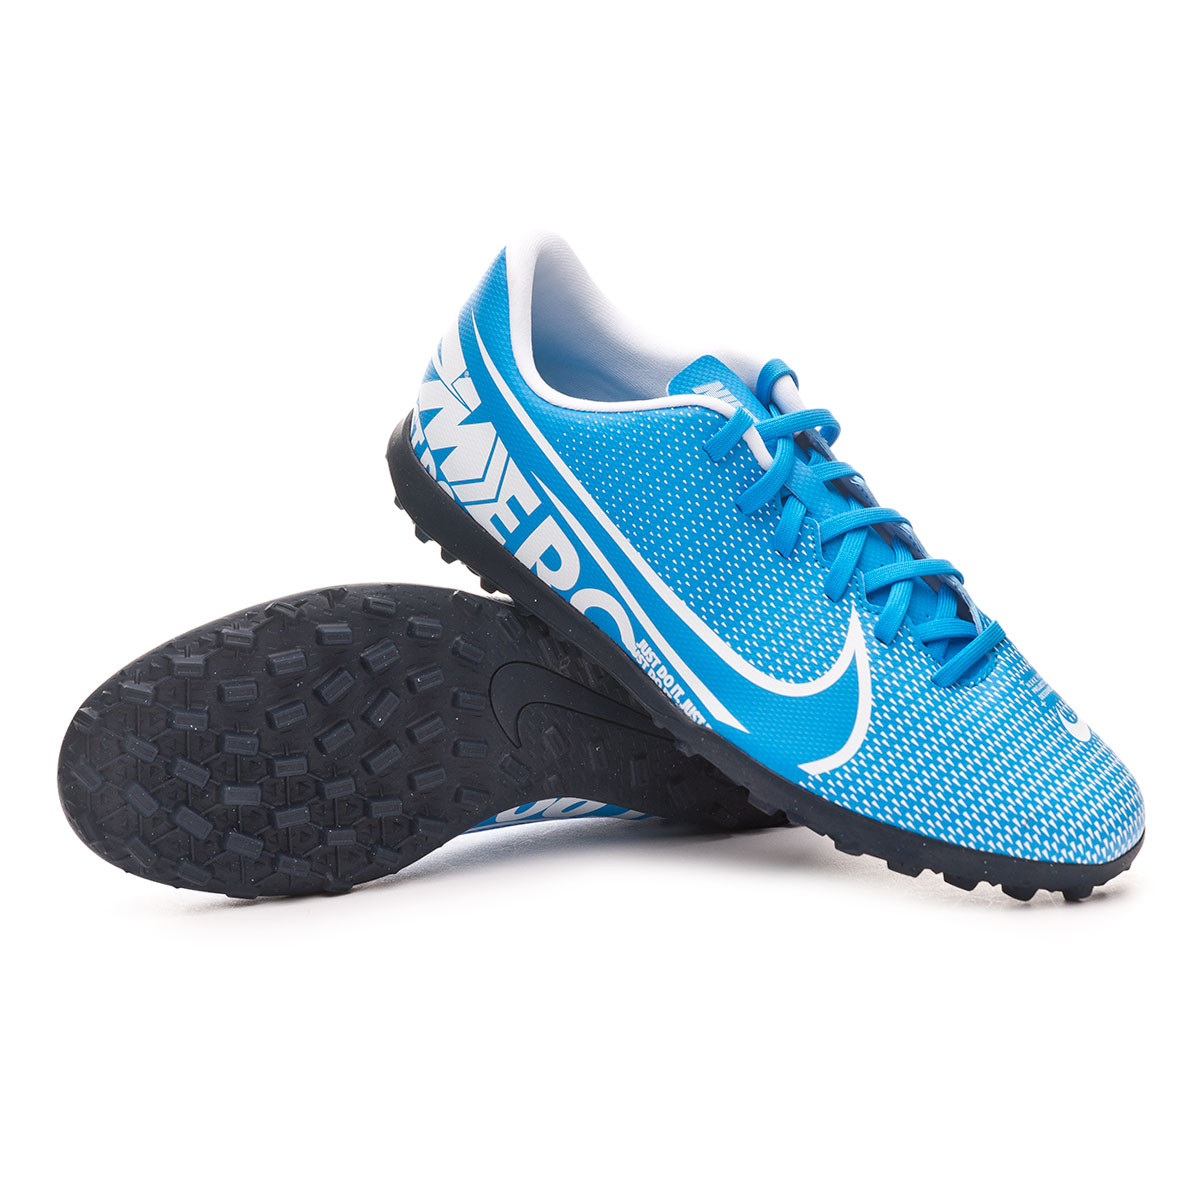 Chuteira Nike Mercurial Vapor XIII Club Turf